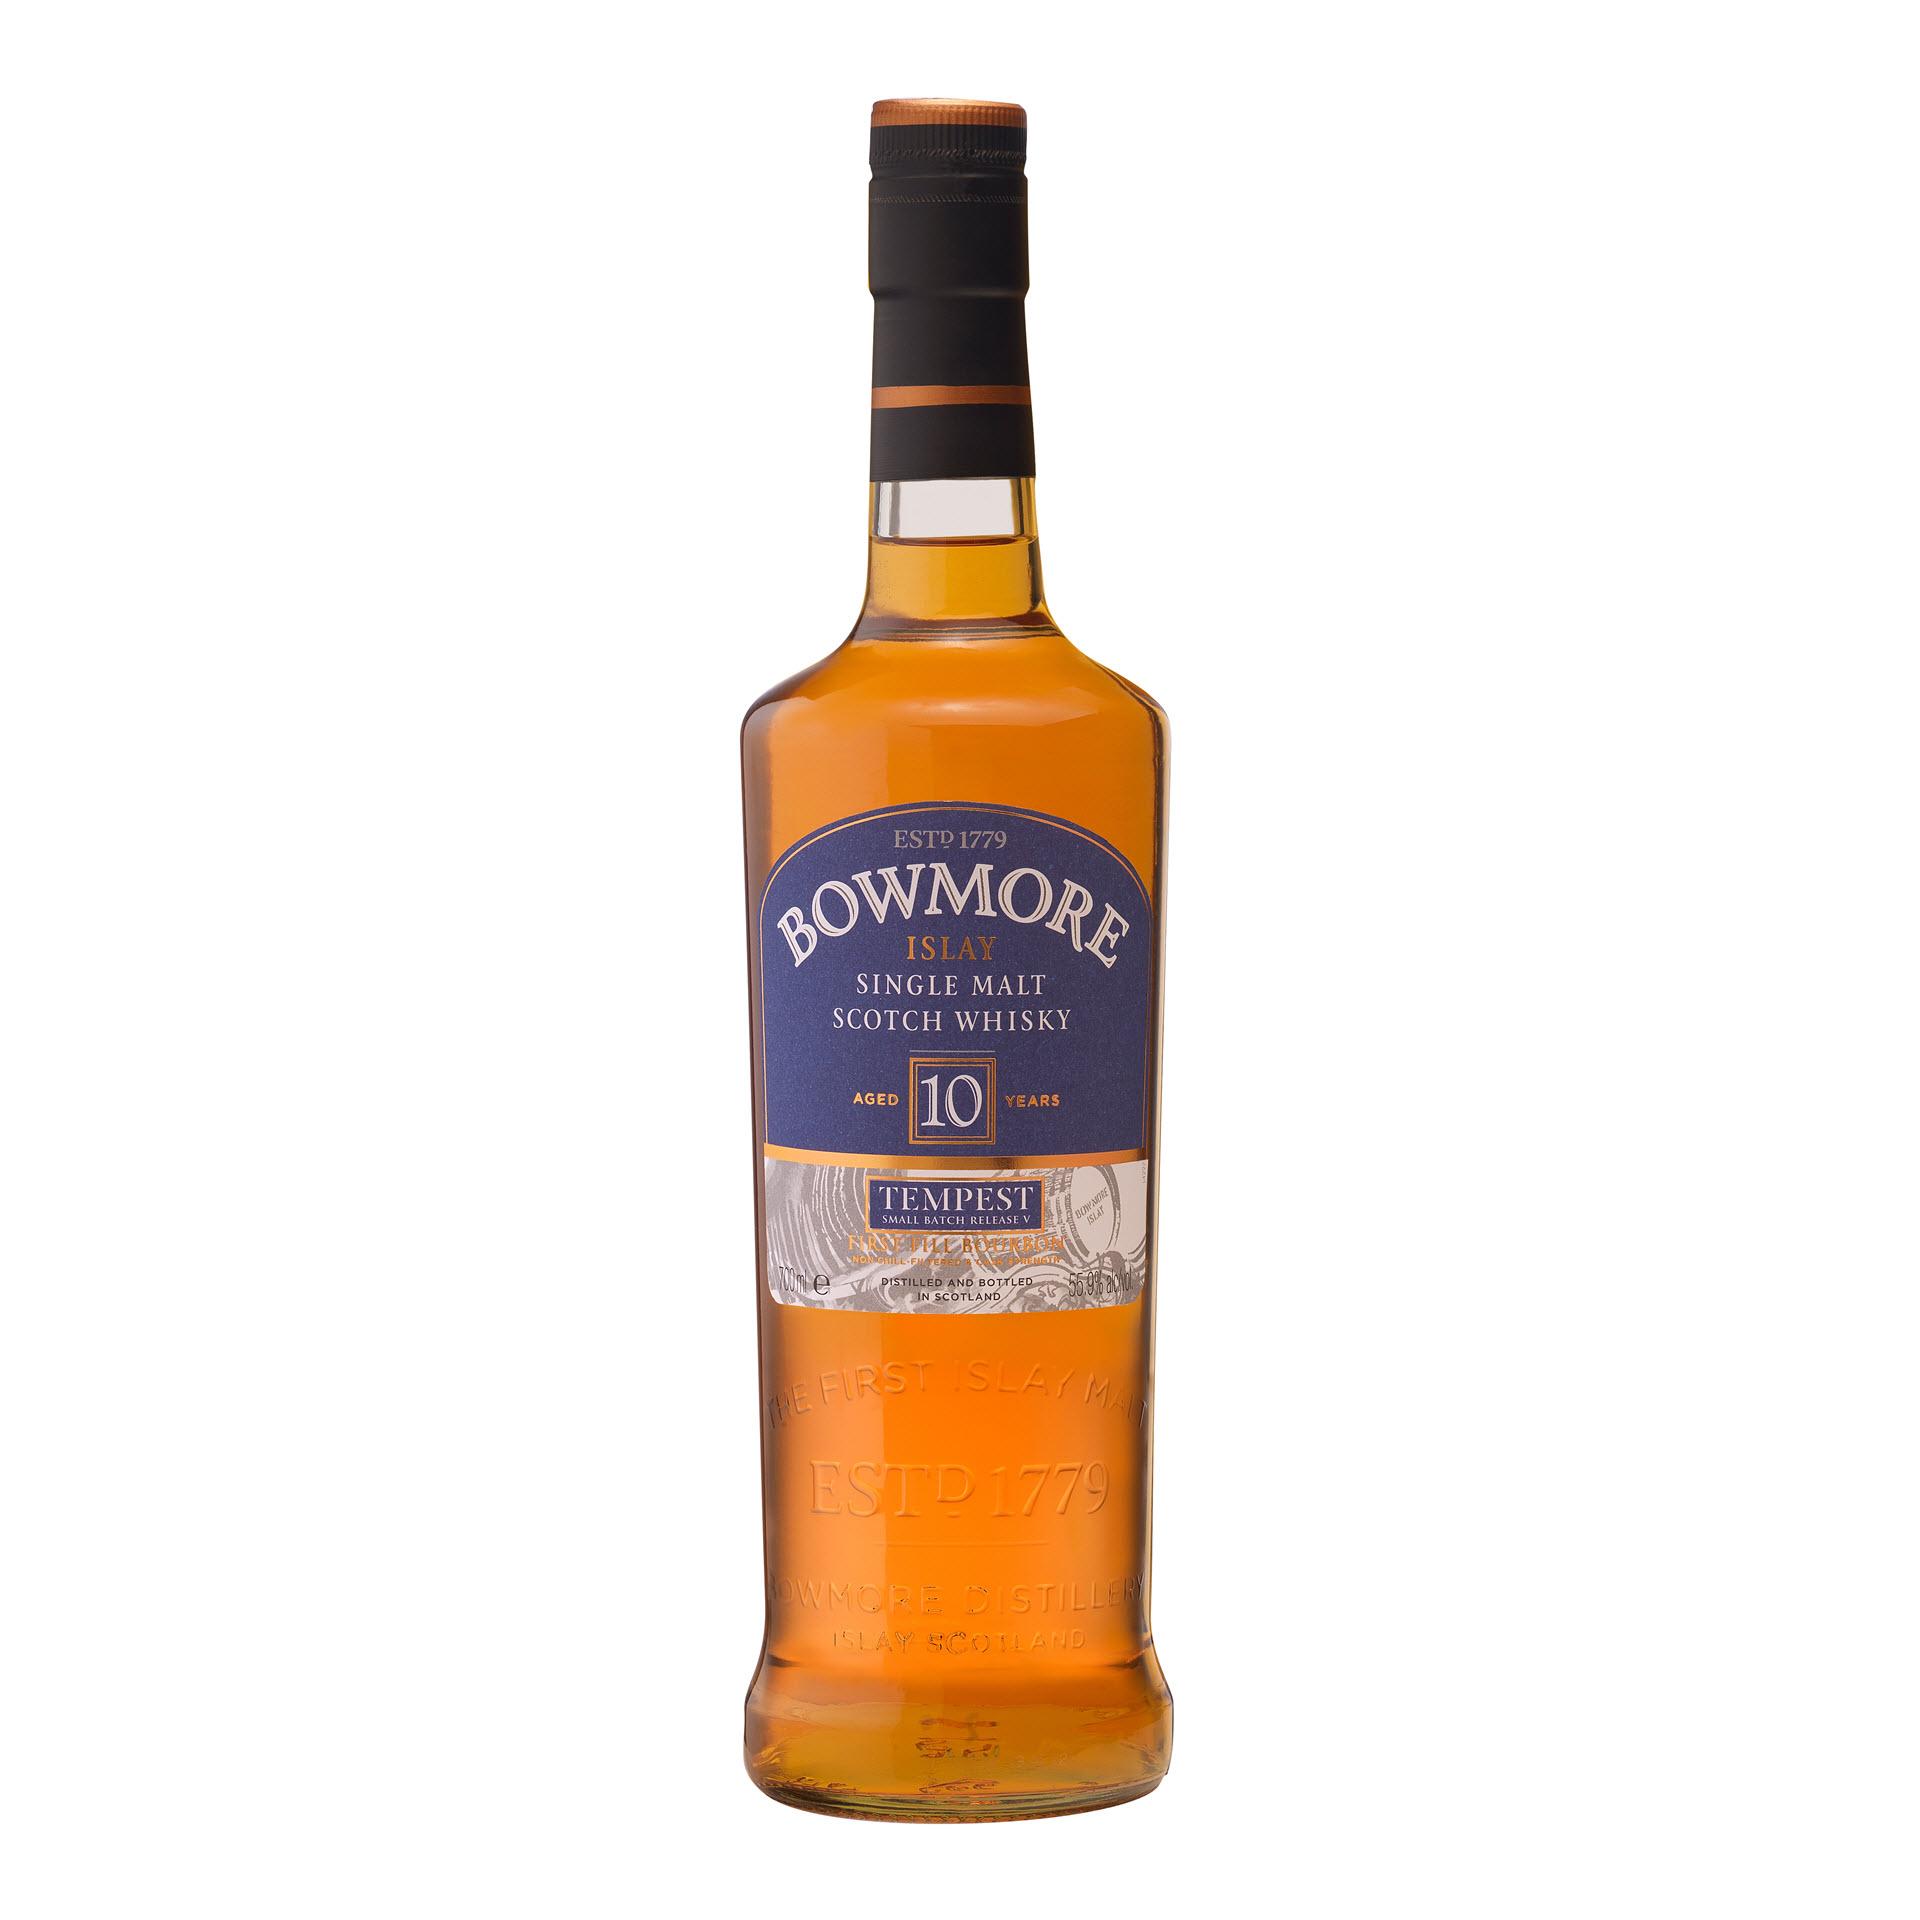 Bowmore islay single malt 10 years